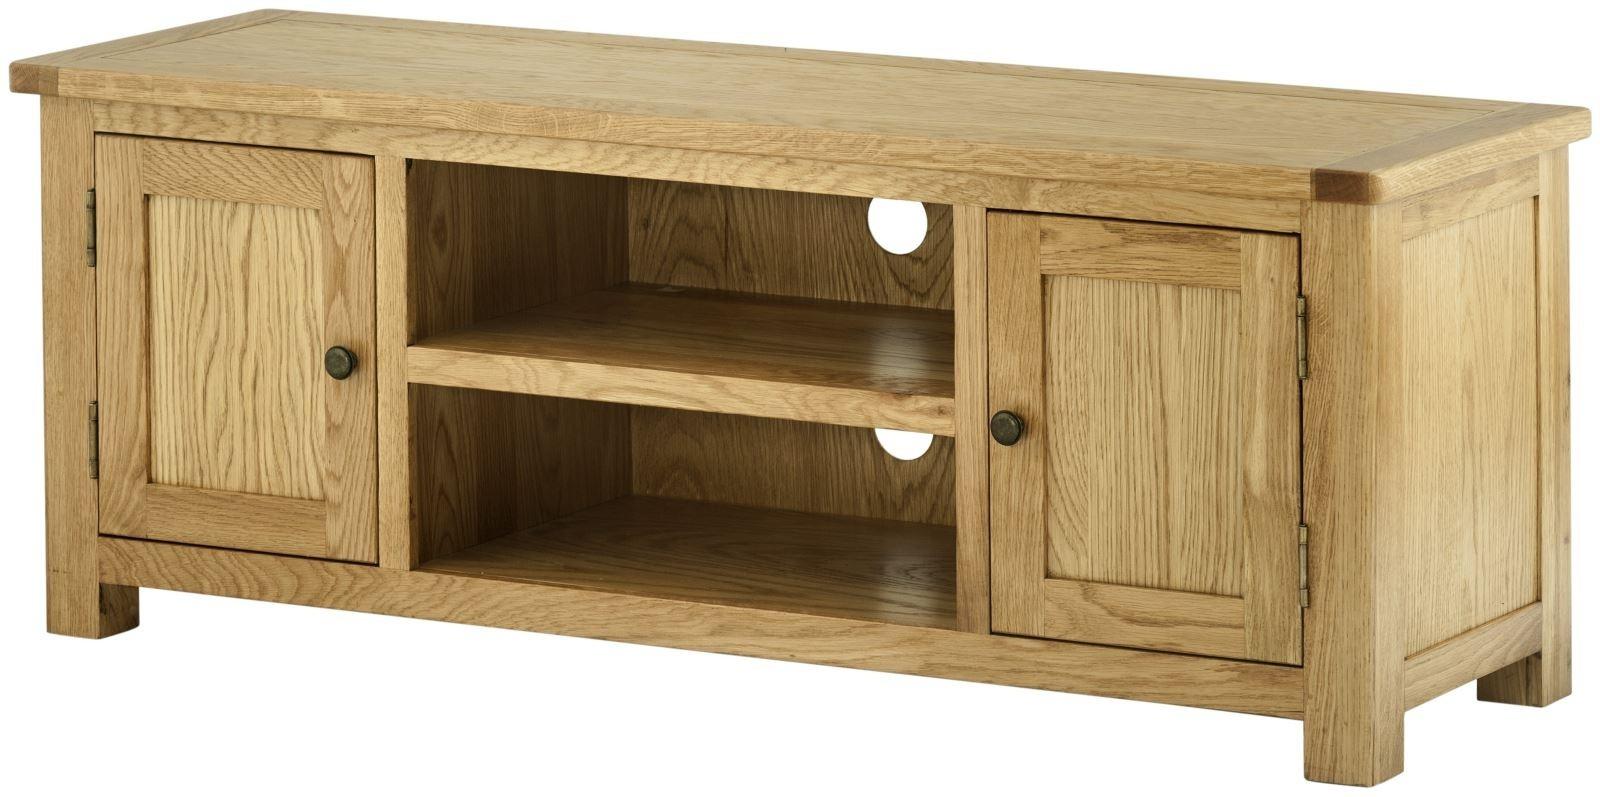 Lundy Oak TV Cabinet - Large